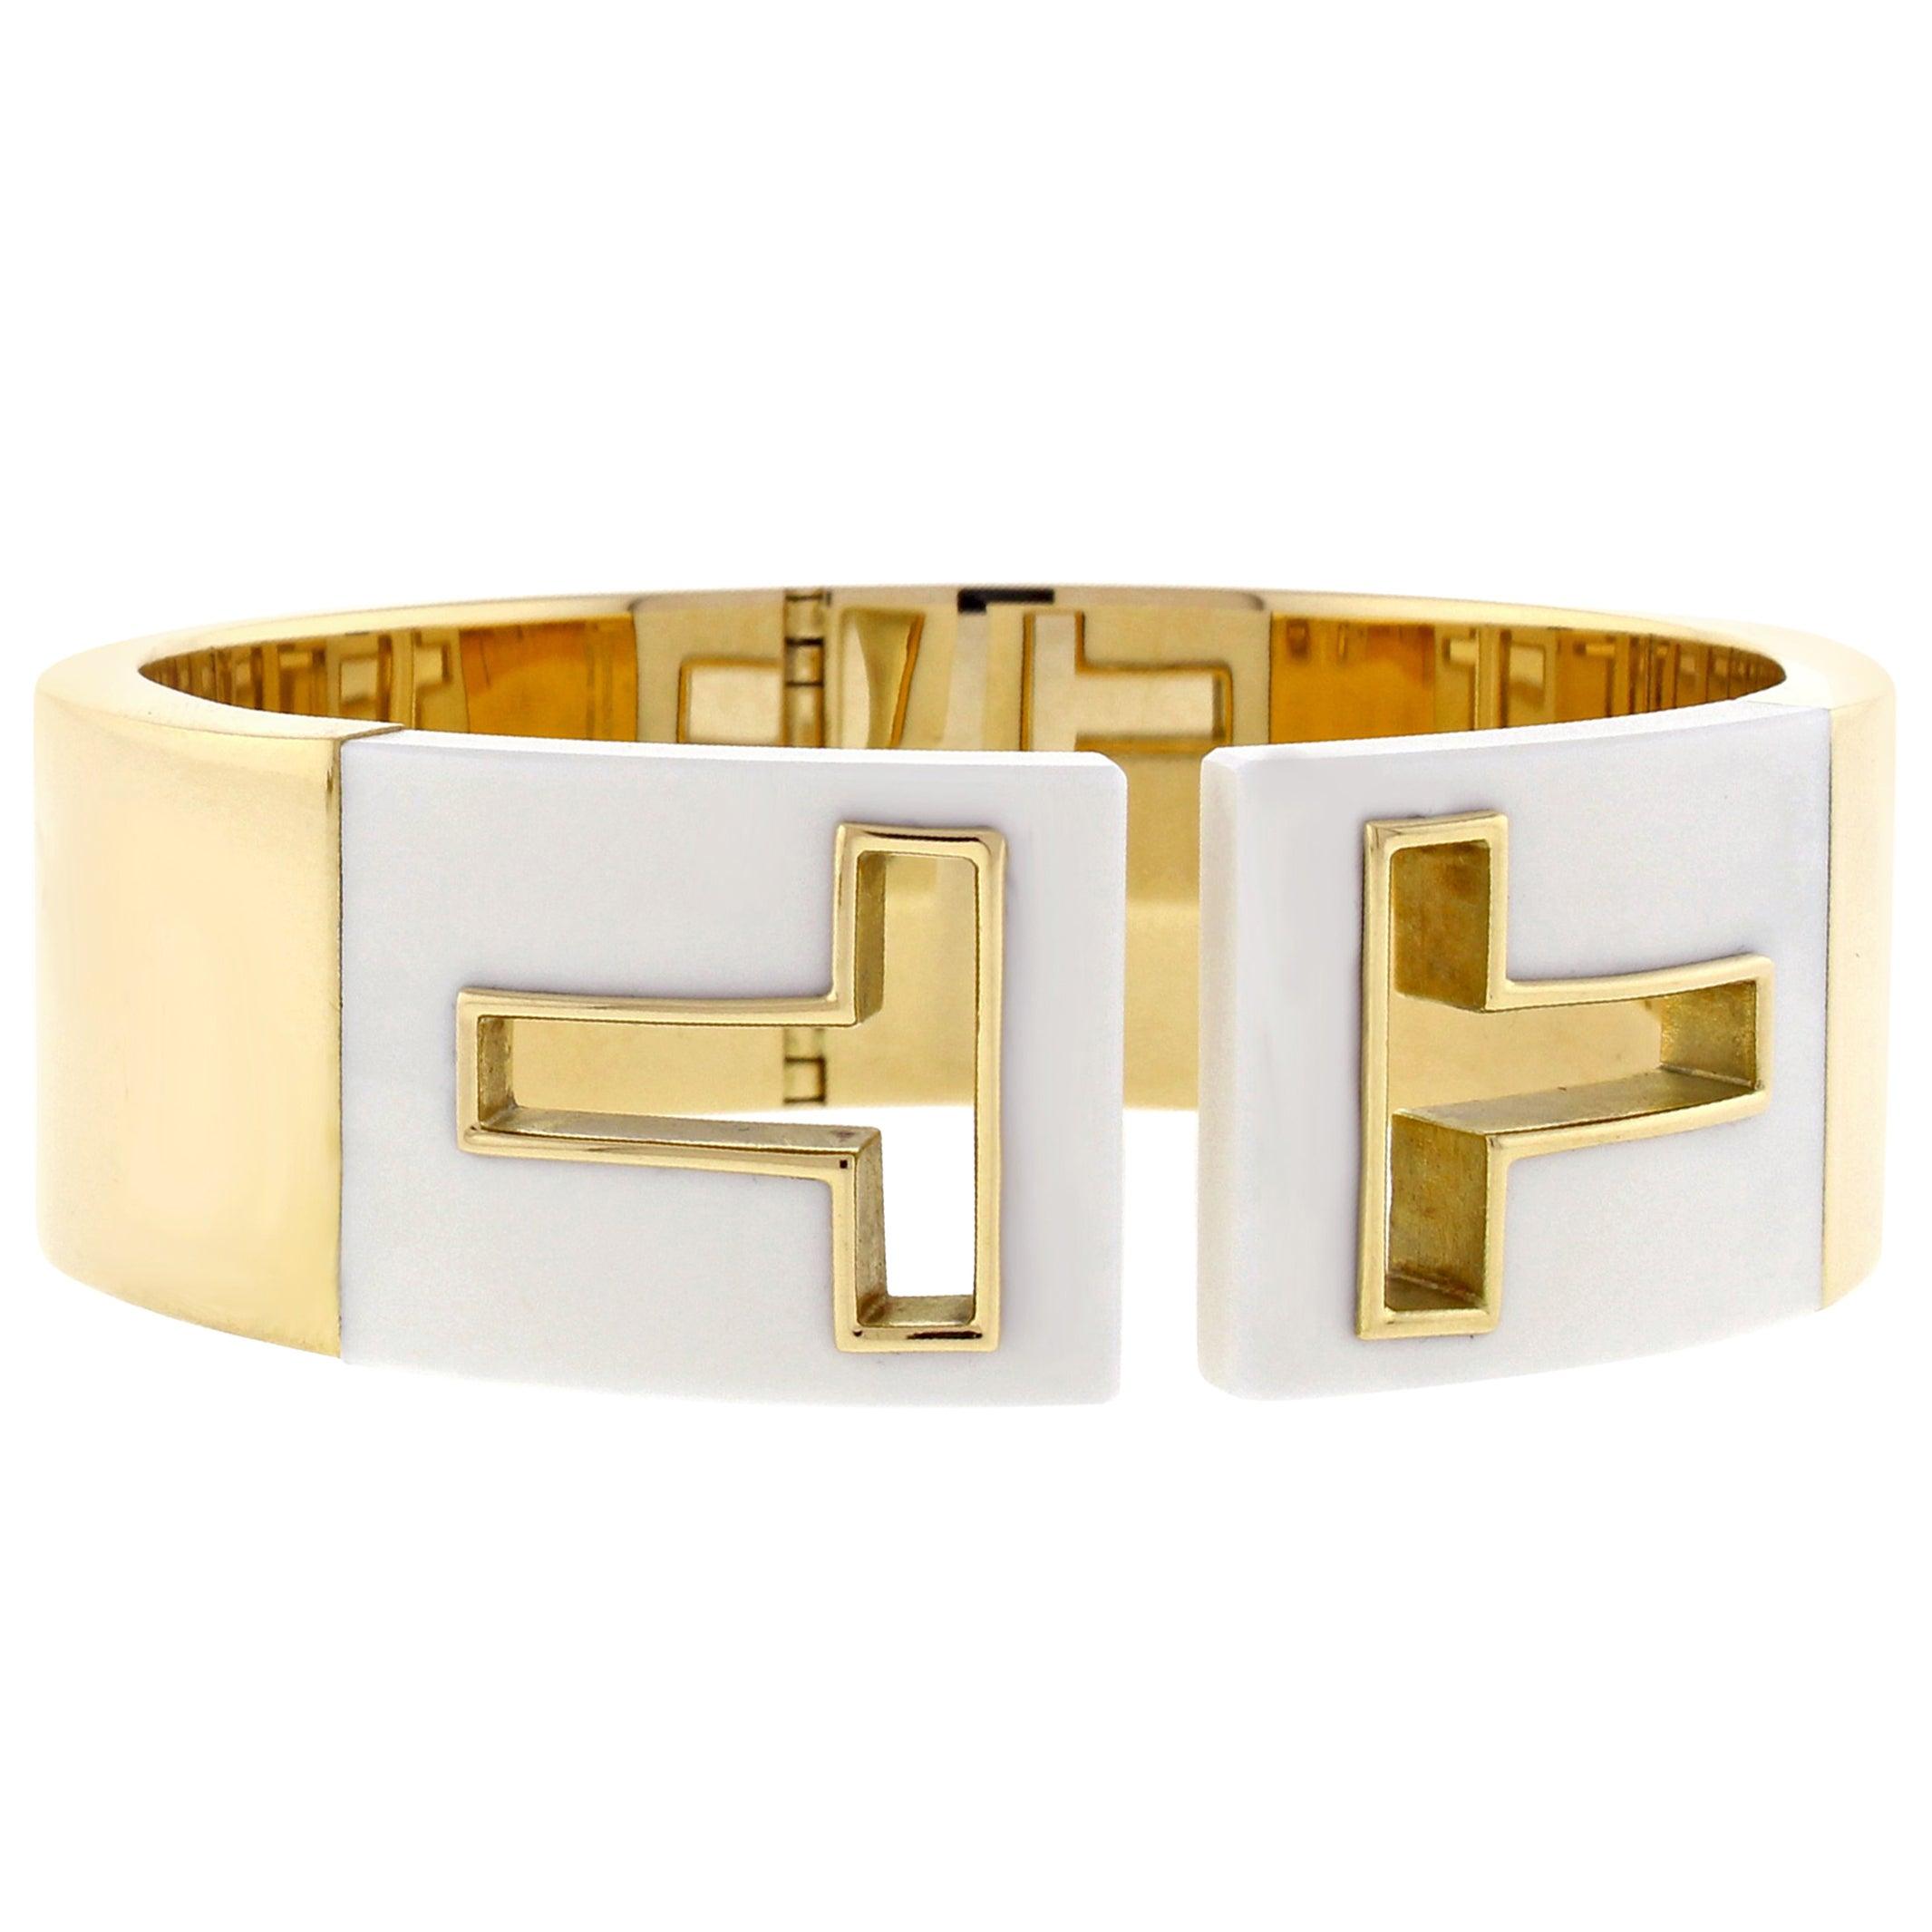 e92d5b4f2 Tiffany and Co. T Cutout Cuff Bangle Bracelet at 1stdibs